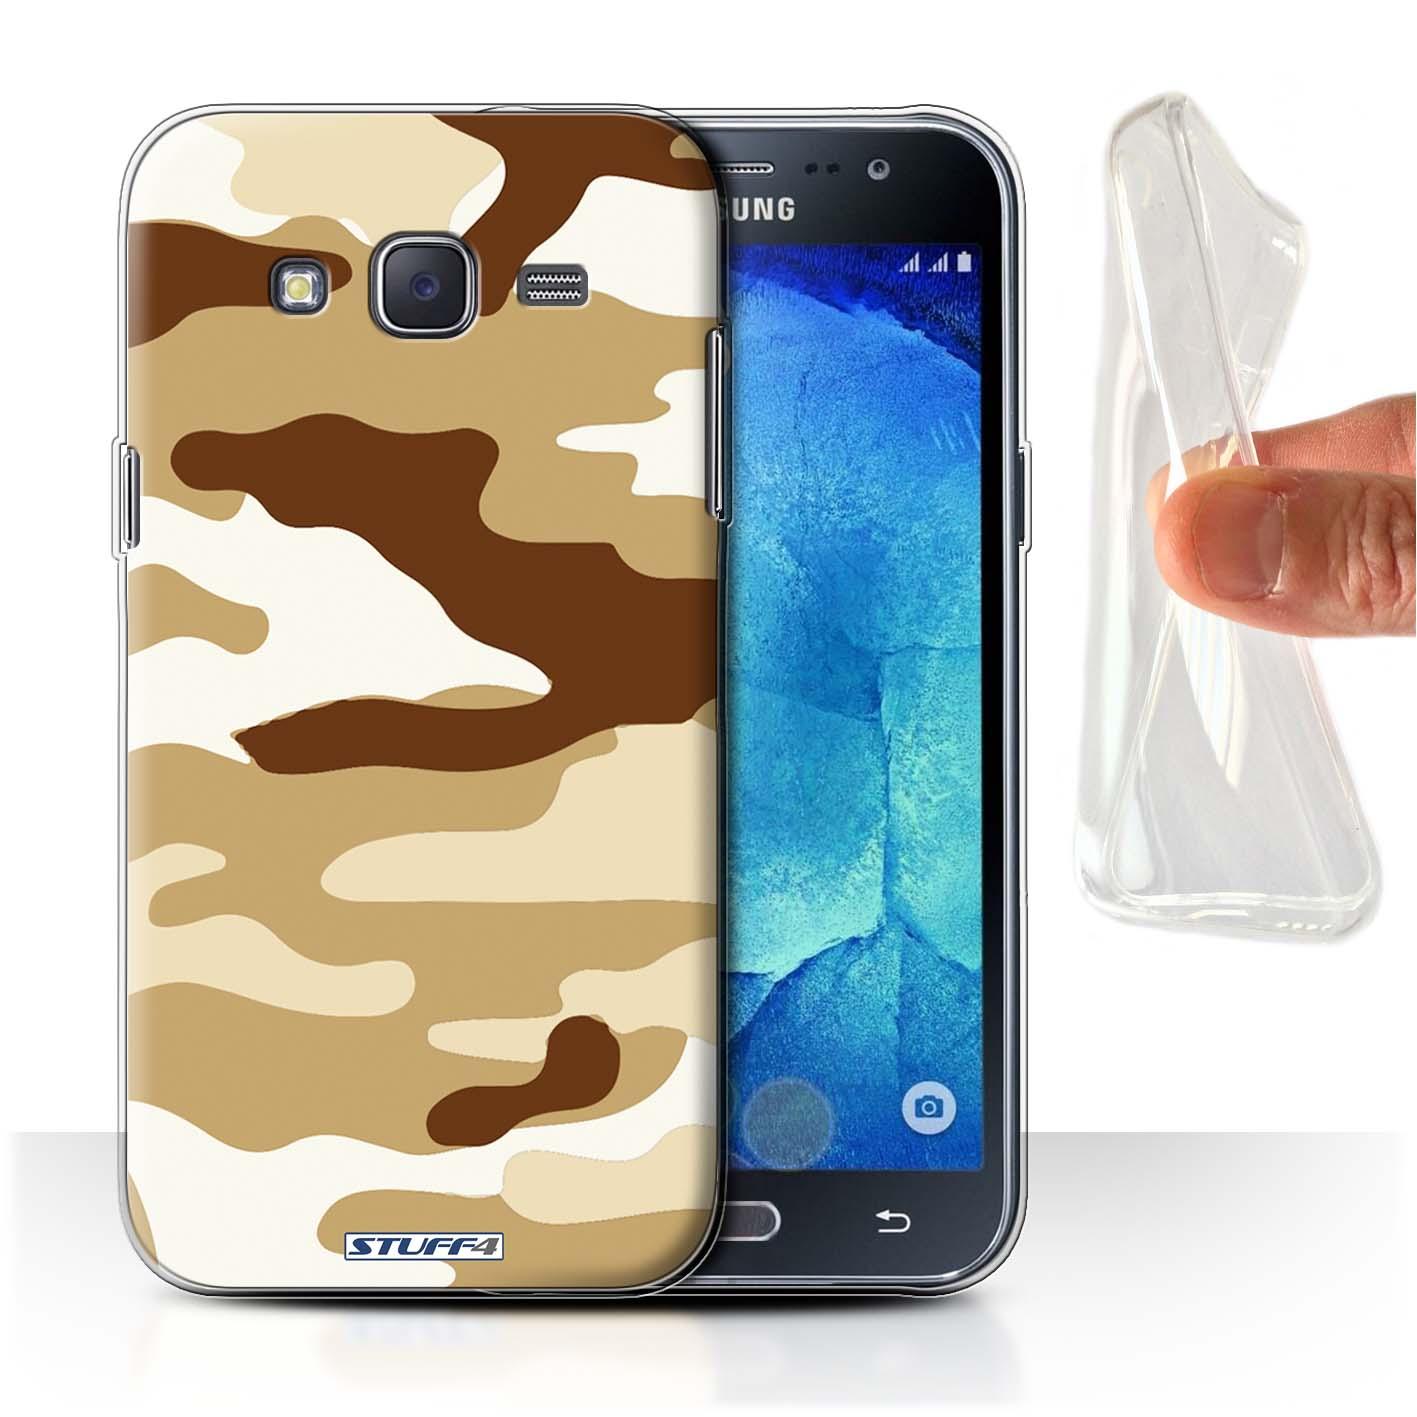 Gel-TPU-Coque-Etui-de-Stuff4-pour-Samsung-Galaxy-J5-J500-Armee-Camouflage